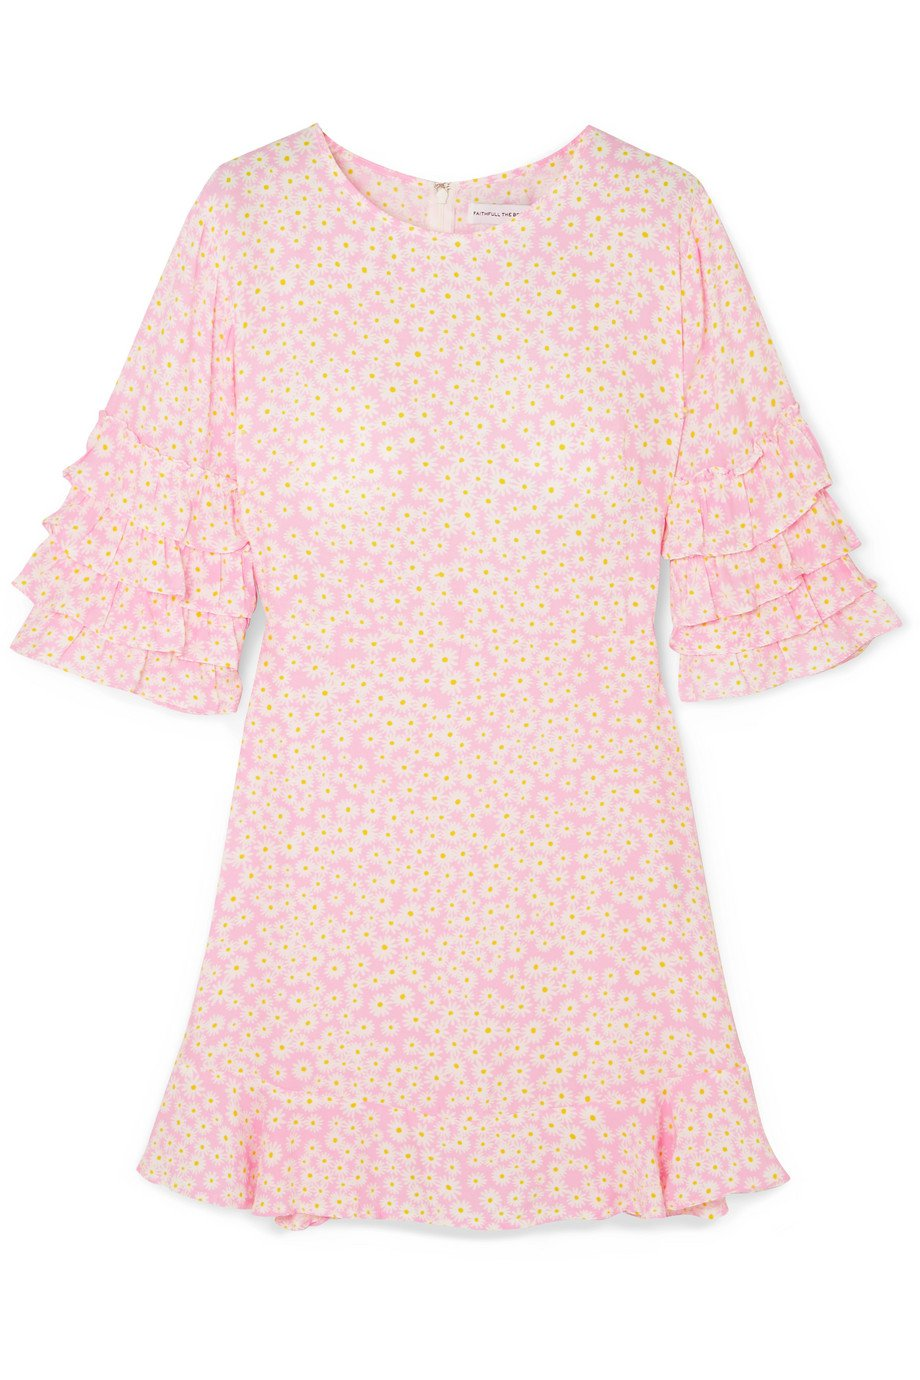 Faithfull The Brand | Serafina ruffled floral-print crepe mini dress | NET-A-PORTER.COM